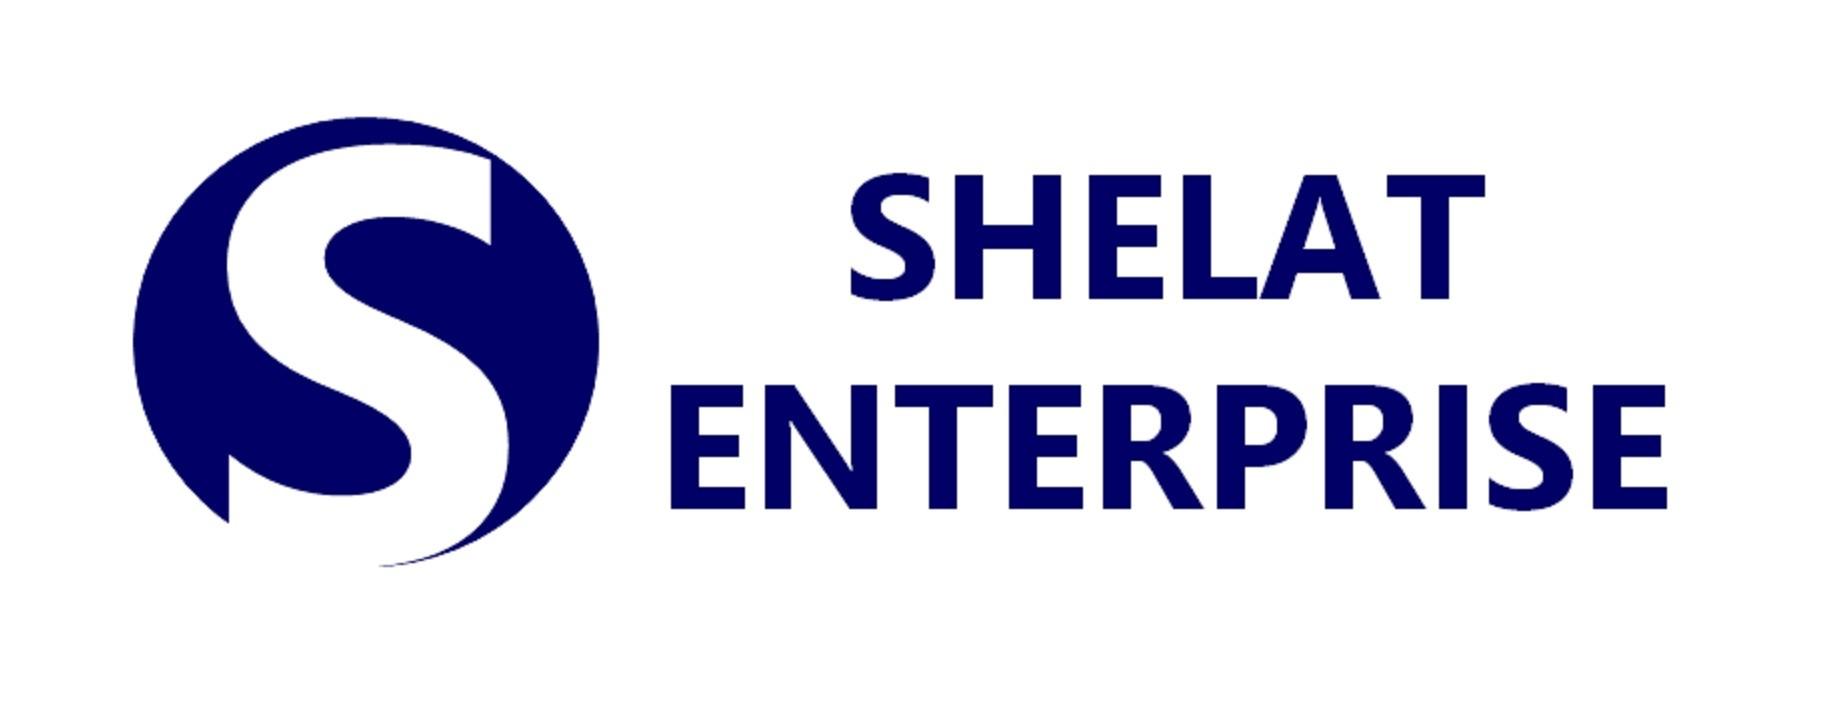 Shelat Enterprise | LinkedIn